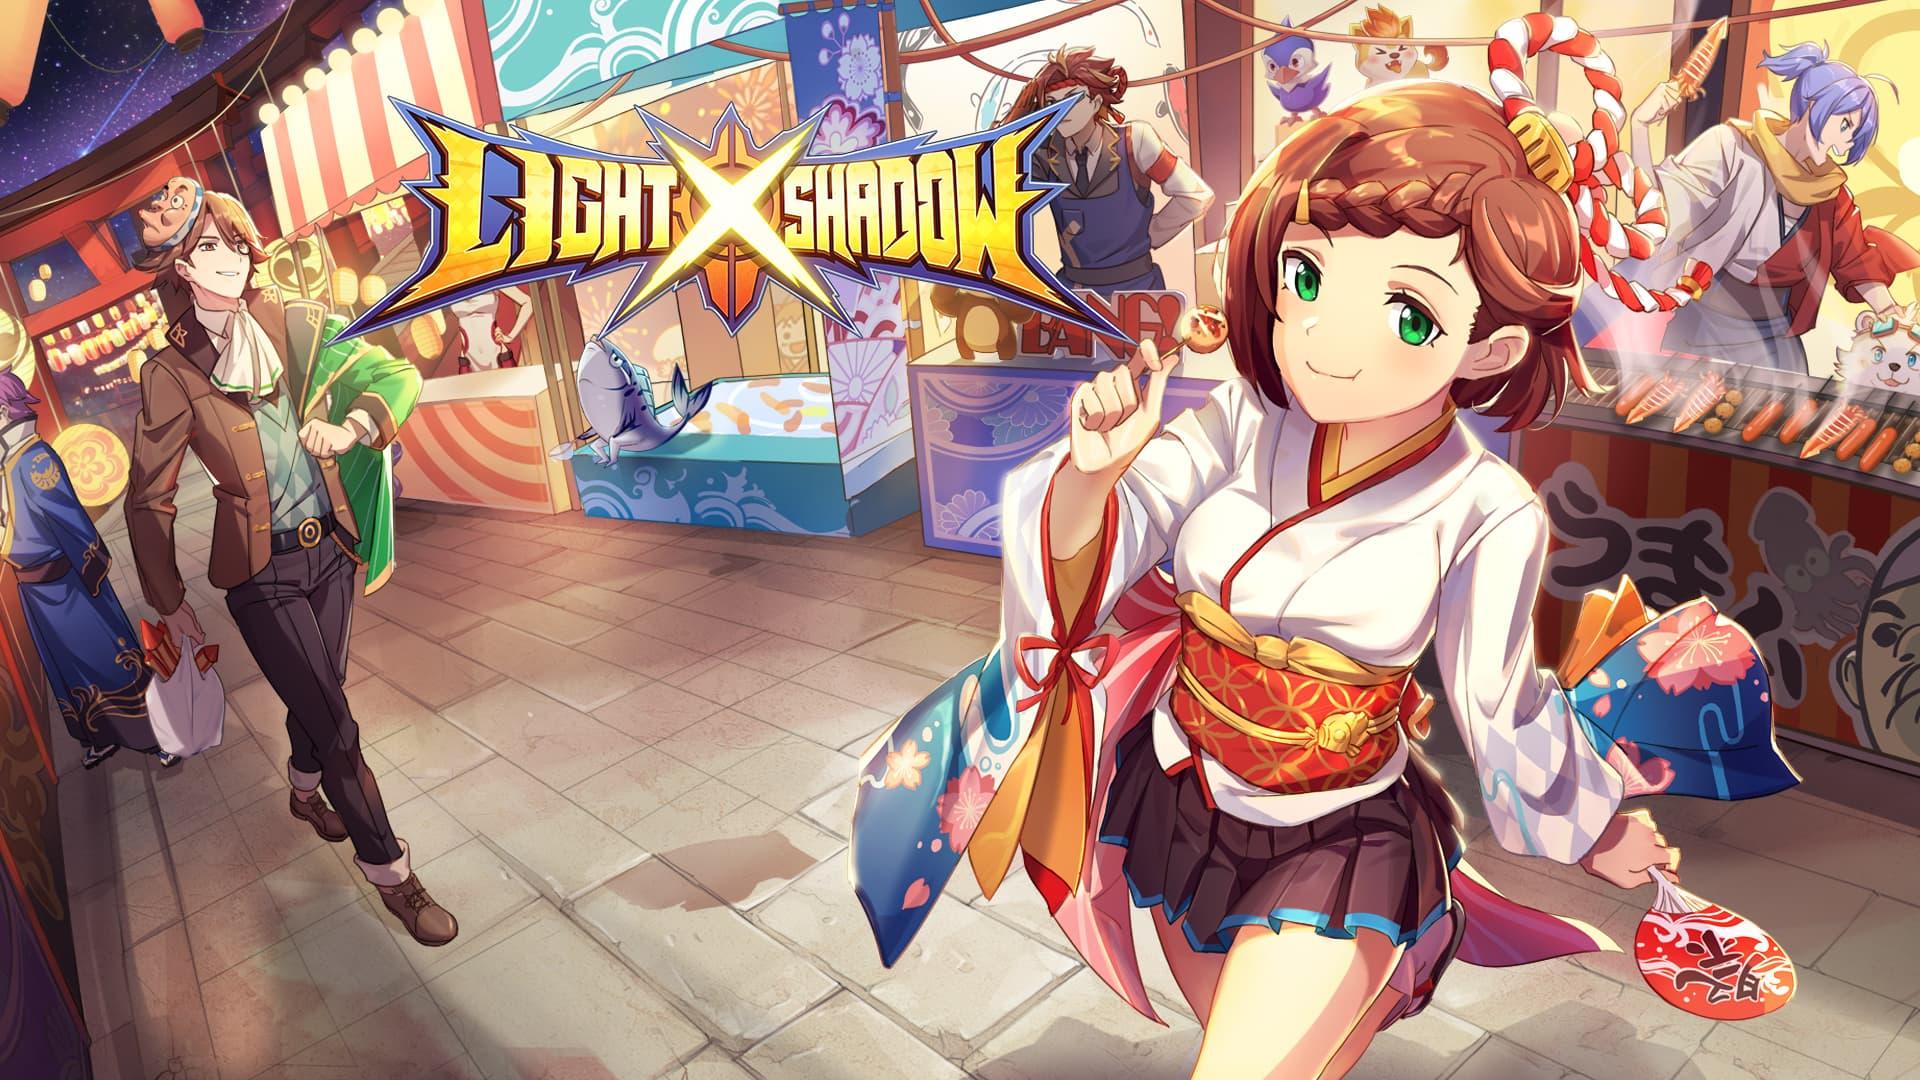 Light Shadow 1692018 1